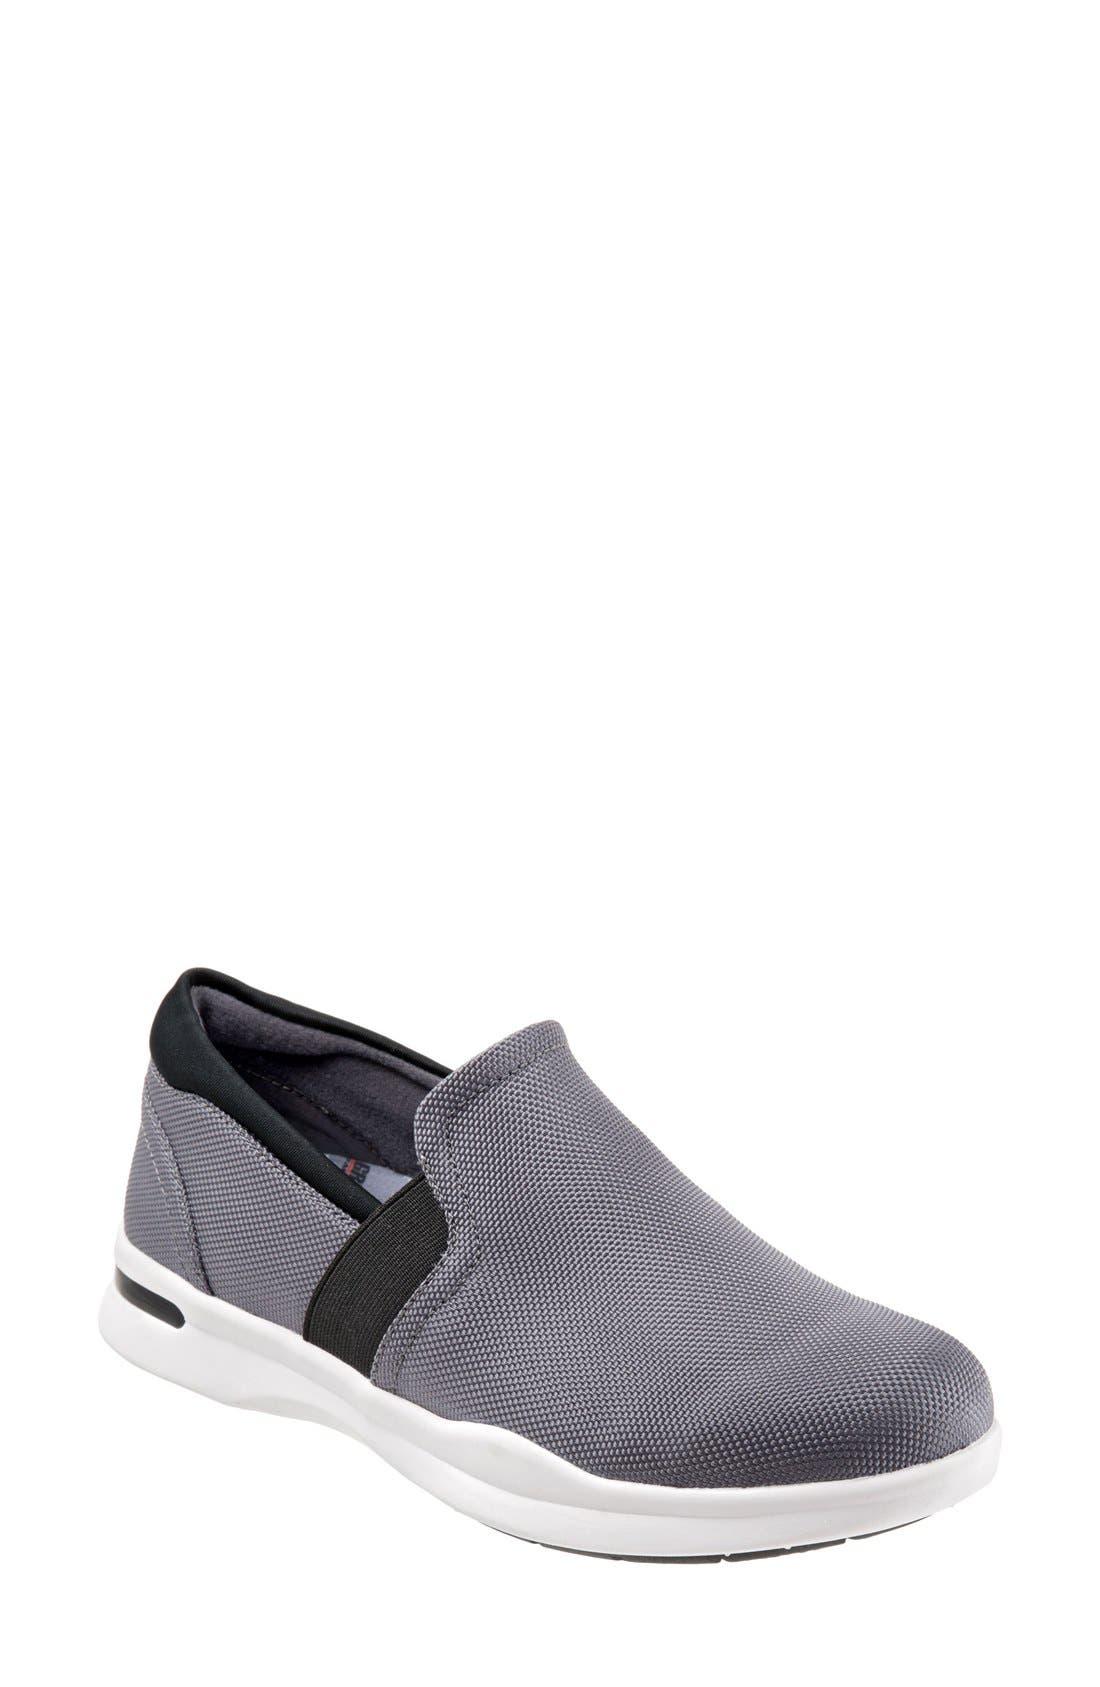 Softwalk® 'Vantage' Slip-On Sneaker (Women)